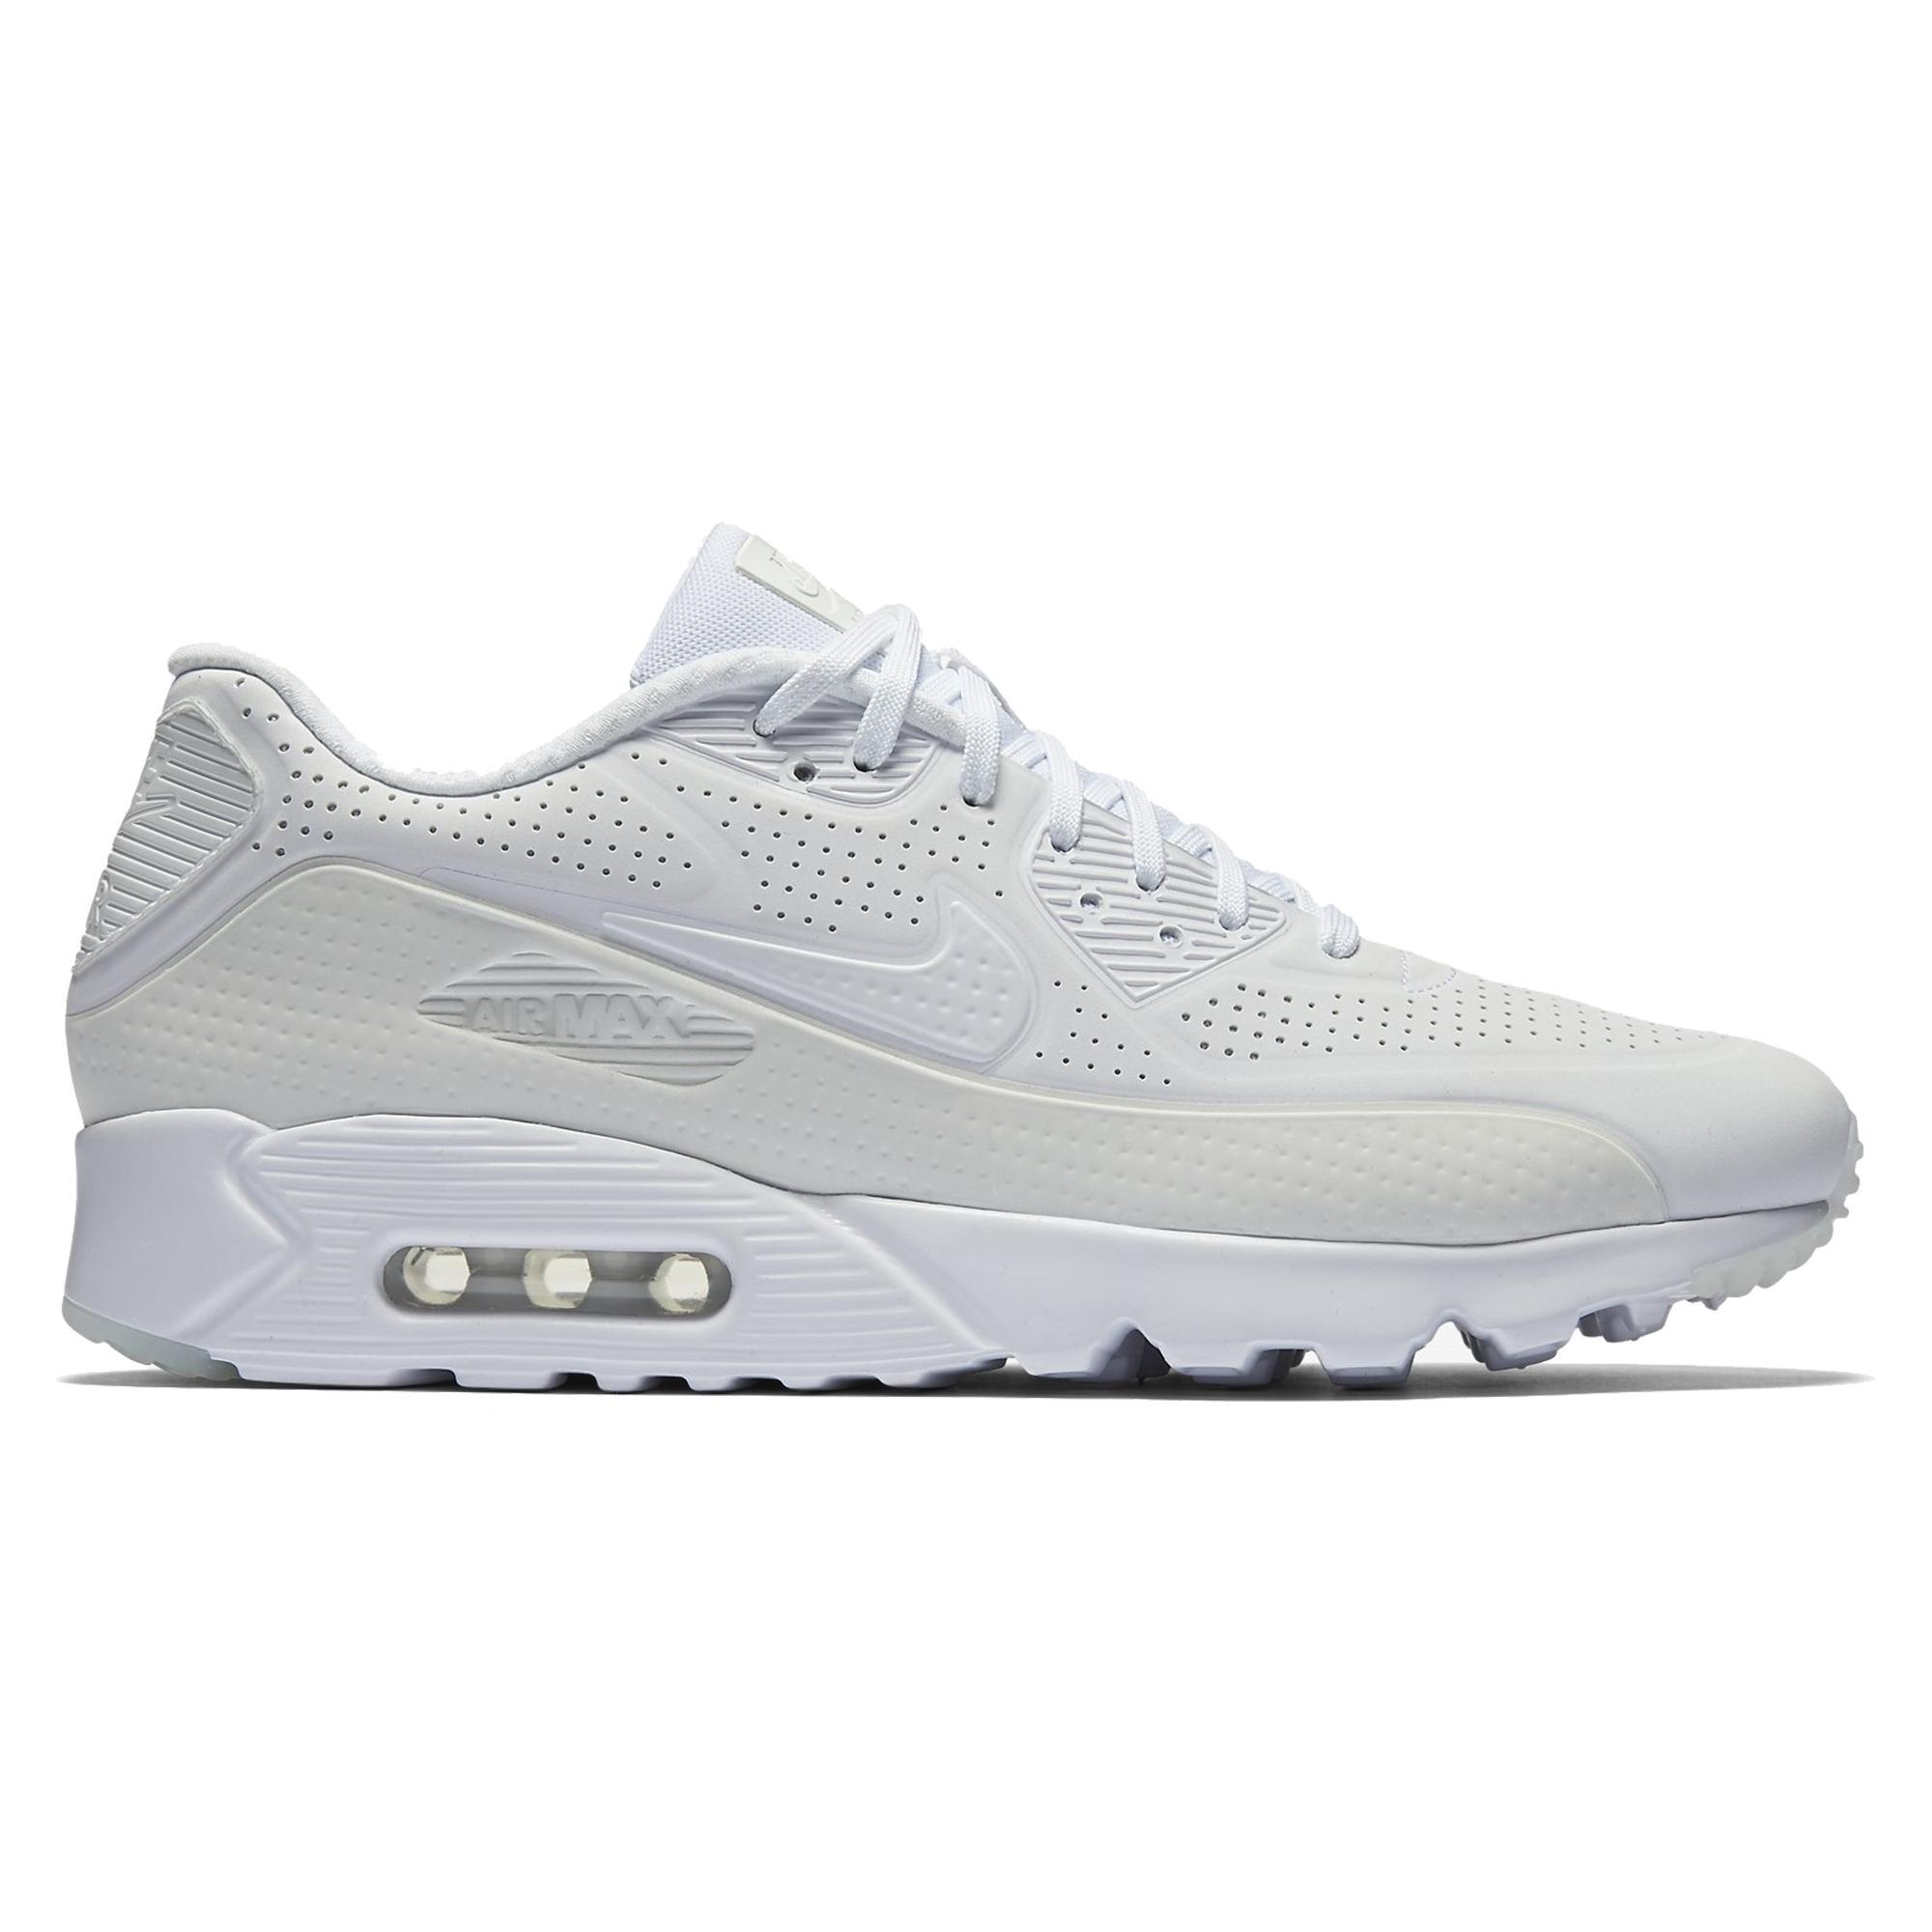 best authentic 0dd4c ed161 ... order nike air max 90 ultra moire erkek spor ayakkab 8bf81 ad0db